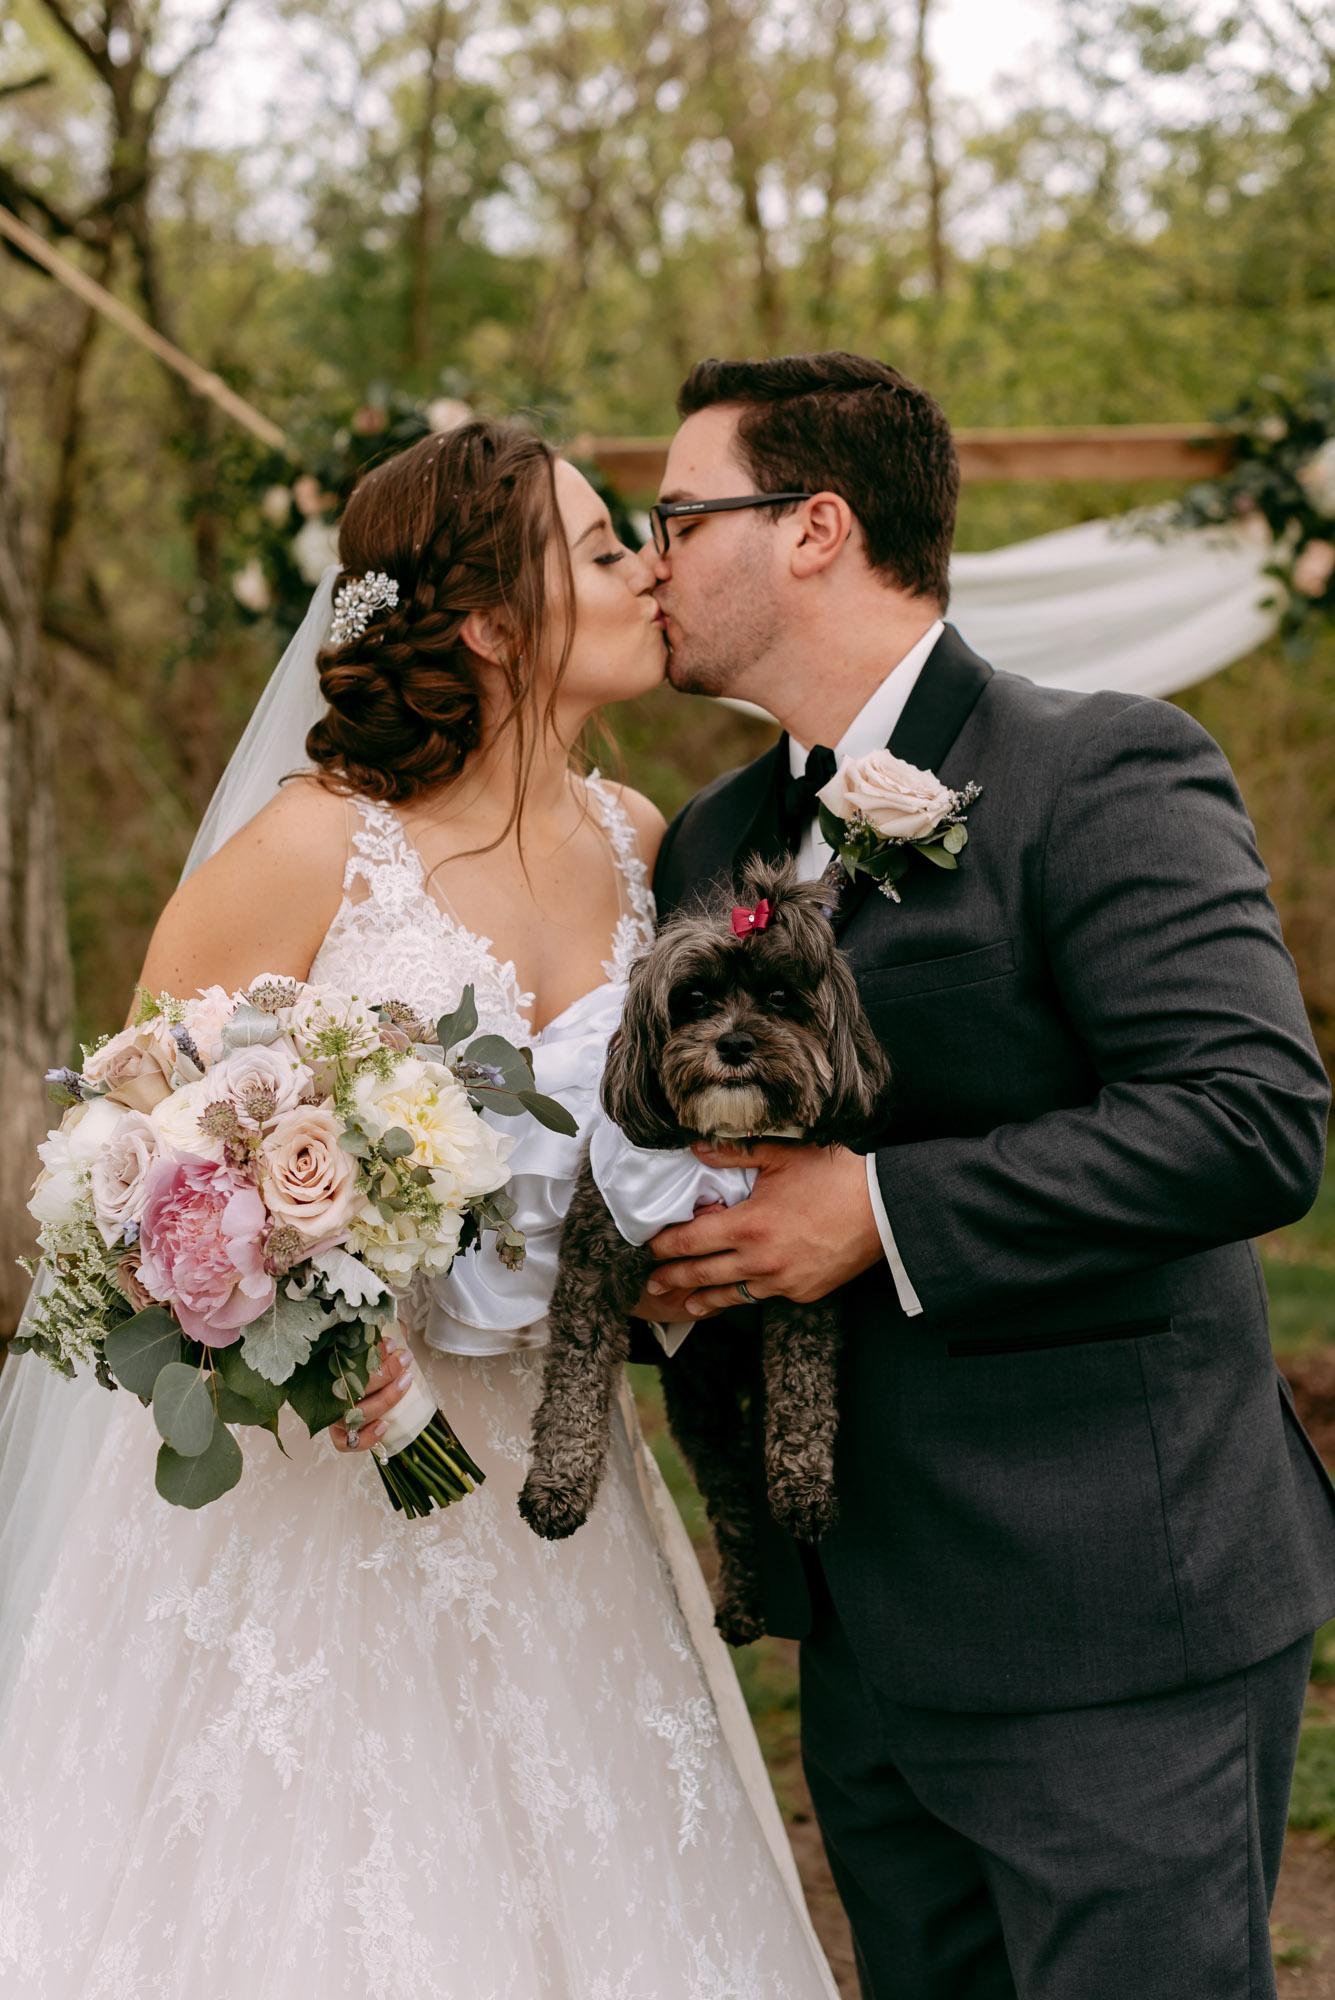 orchard-farms-pavillion-wedding-rockton-IL-wedding-photographers-310.jpg